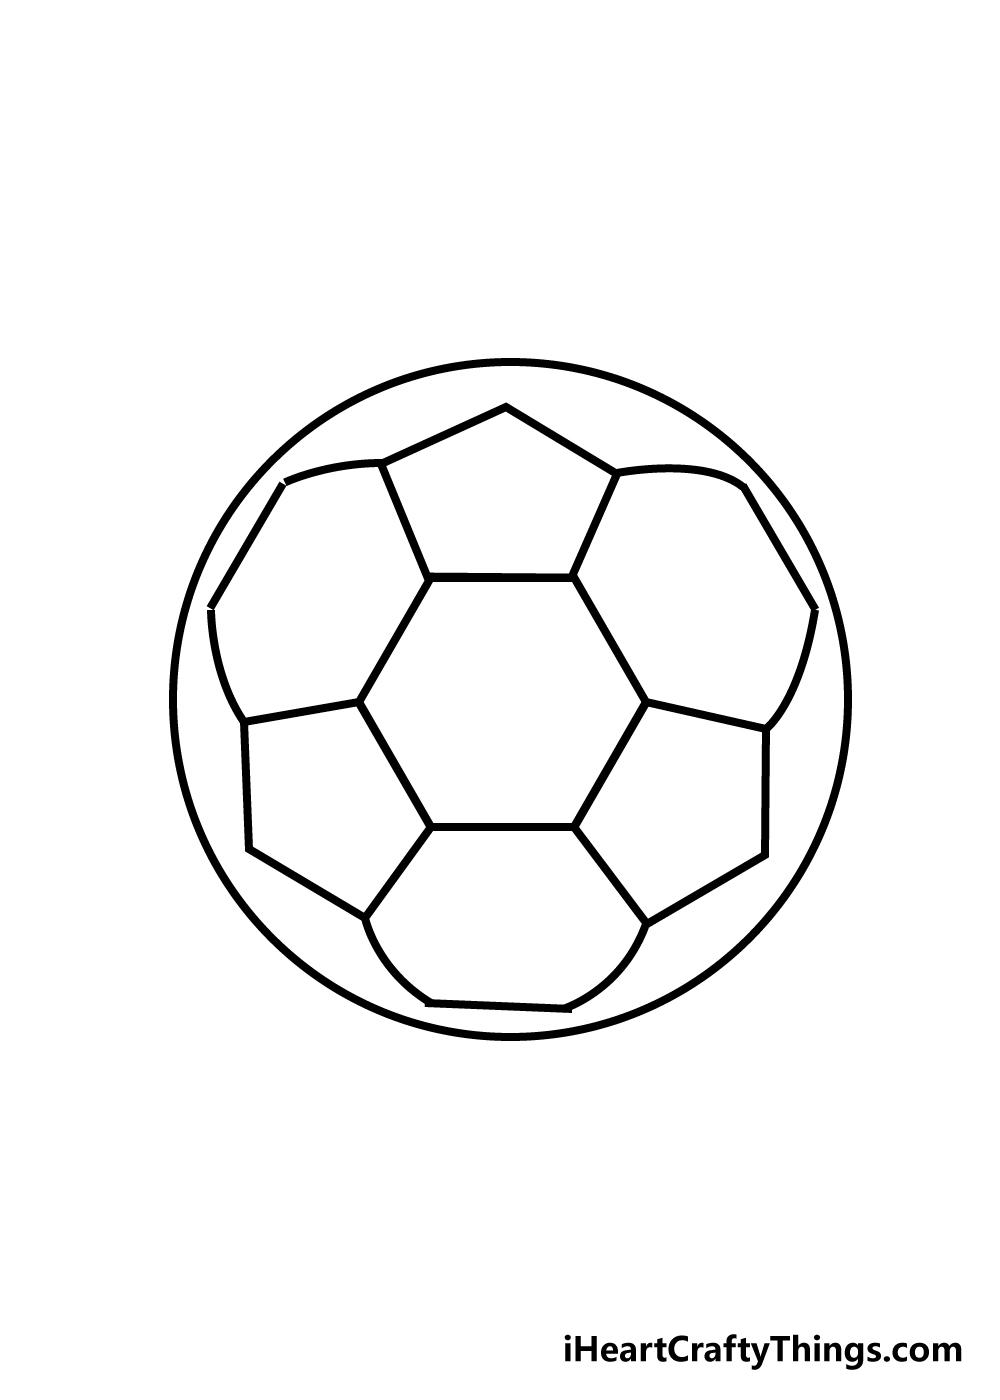 soccer ball drawing step 4